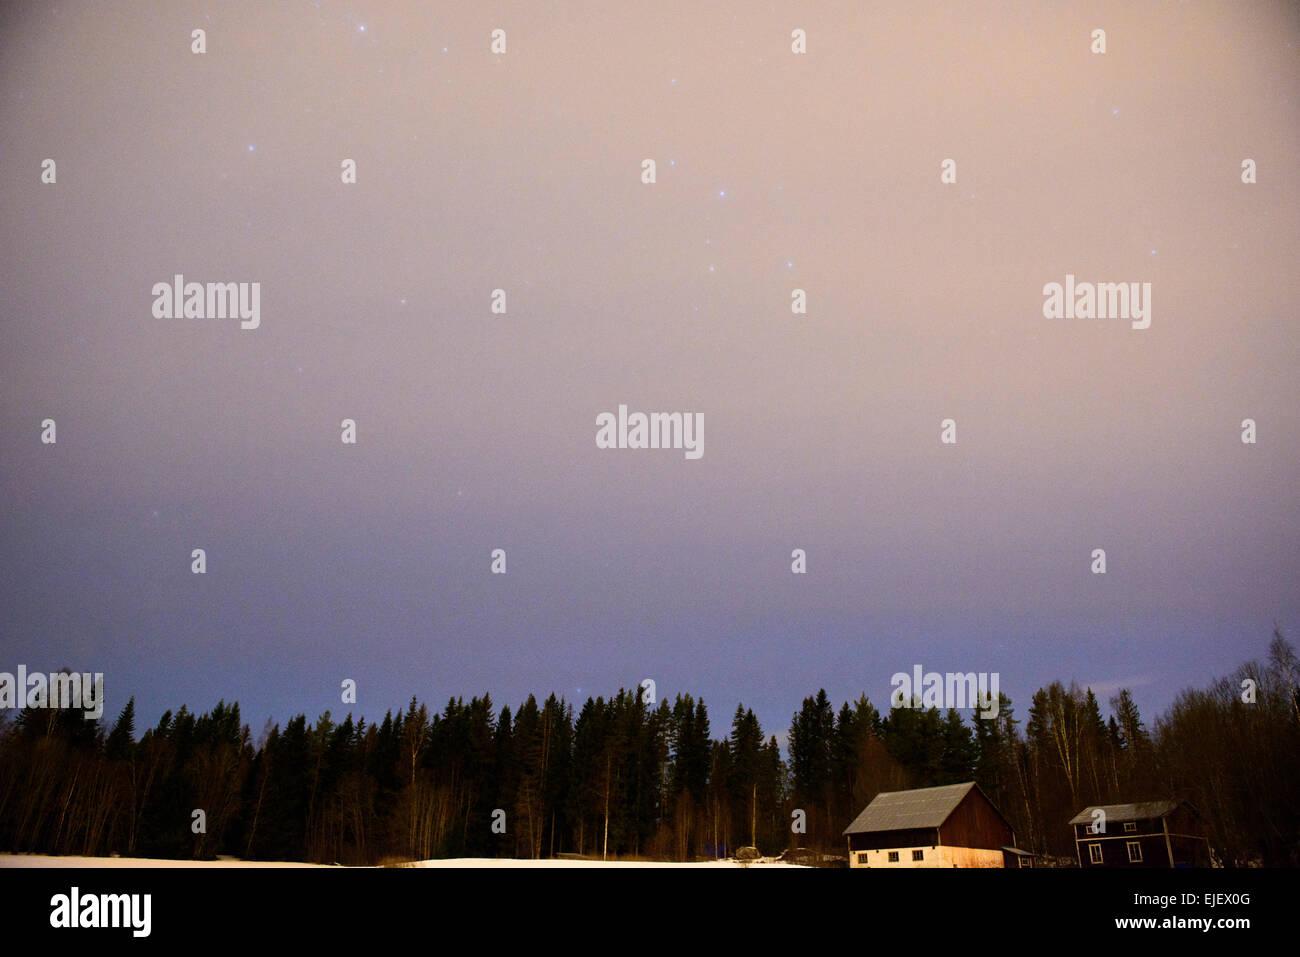 Northern Swedish countryside. - Stock Image